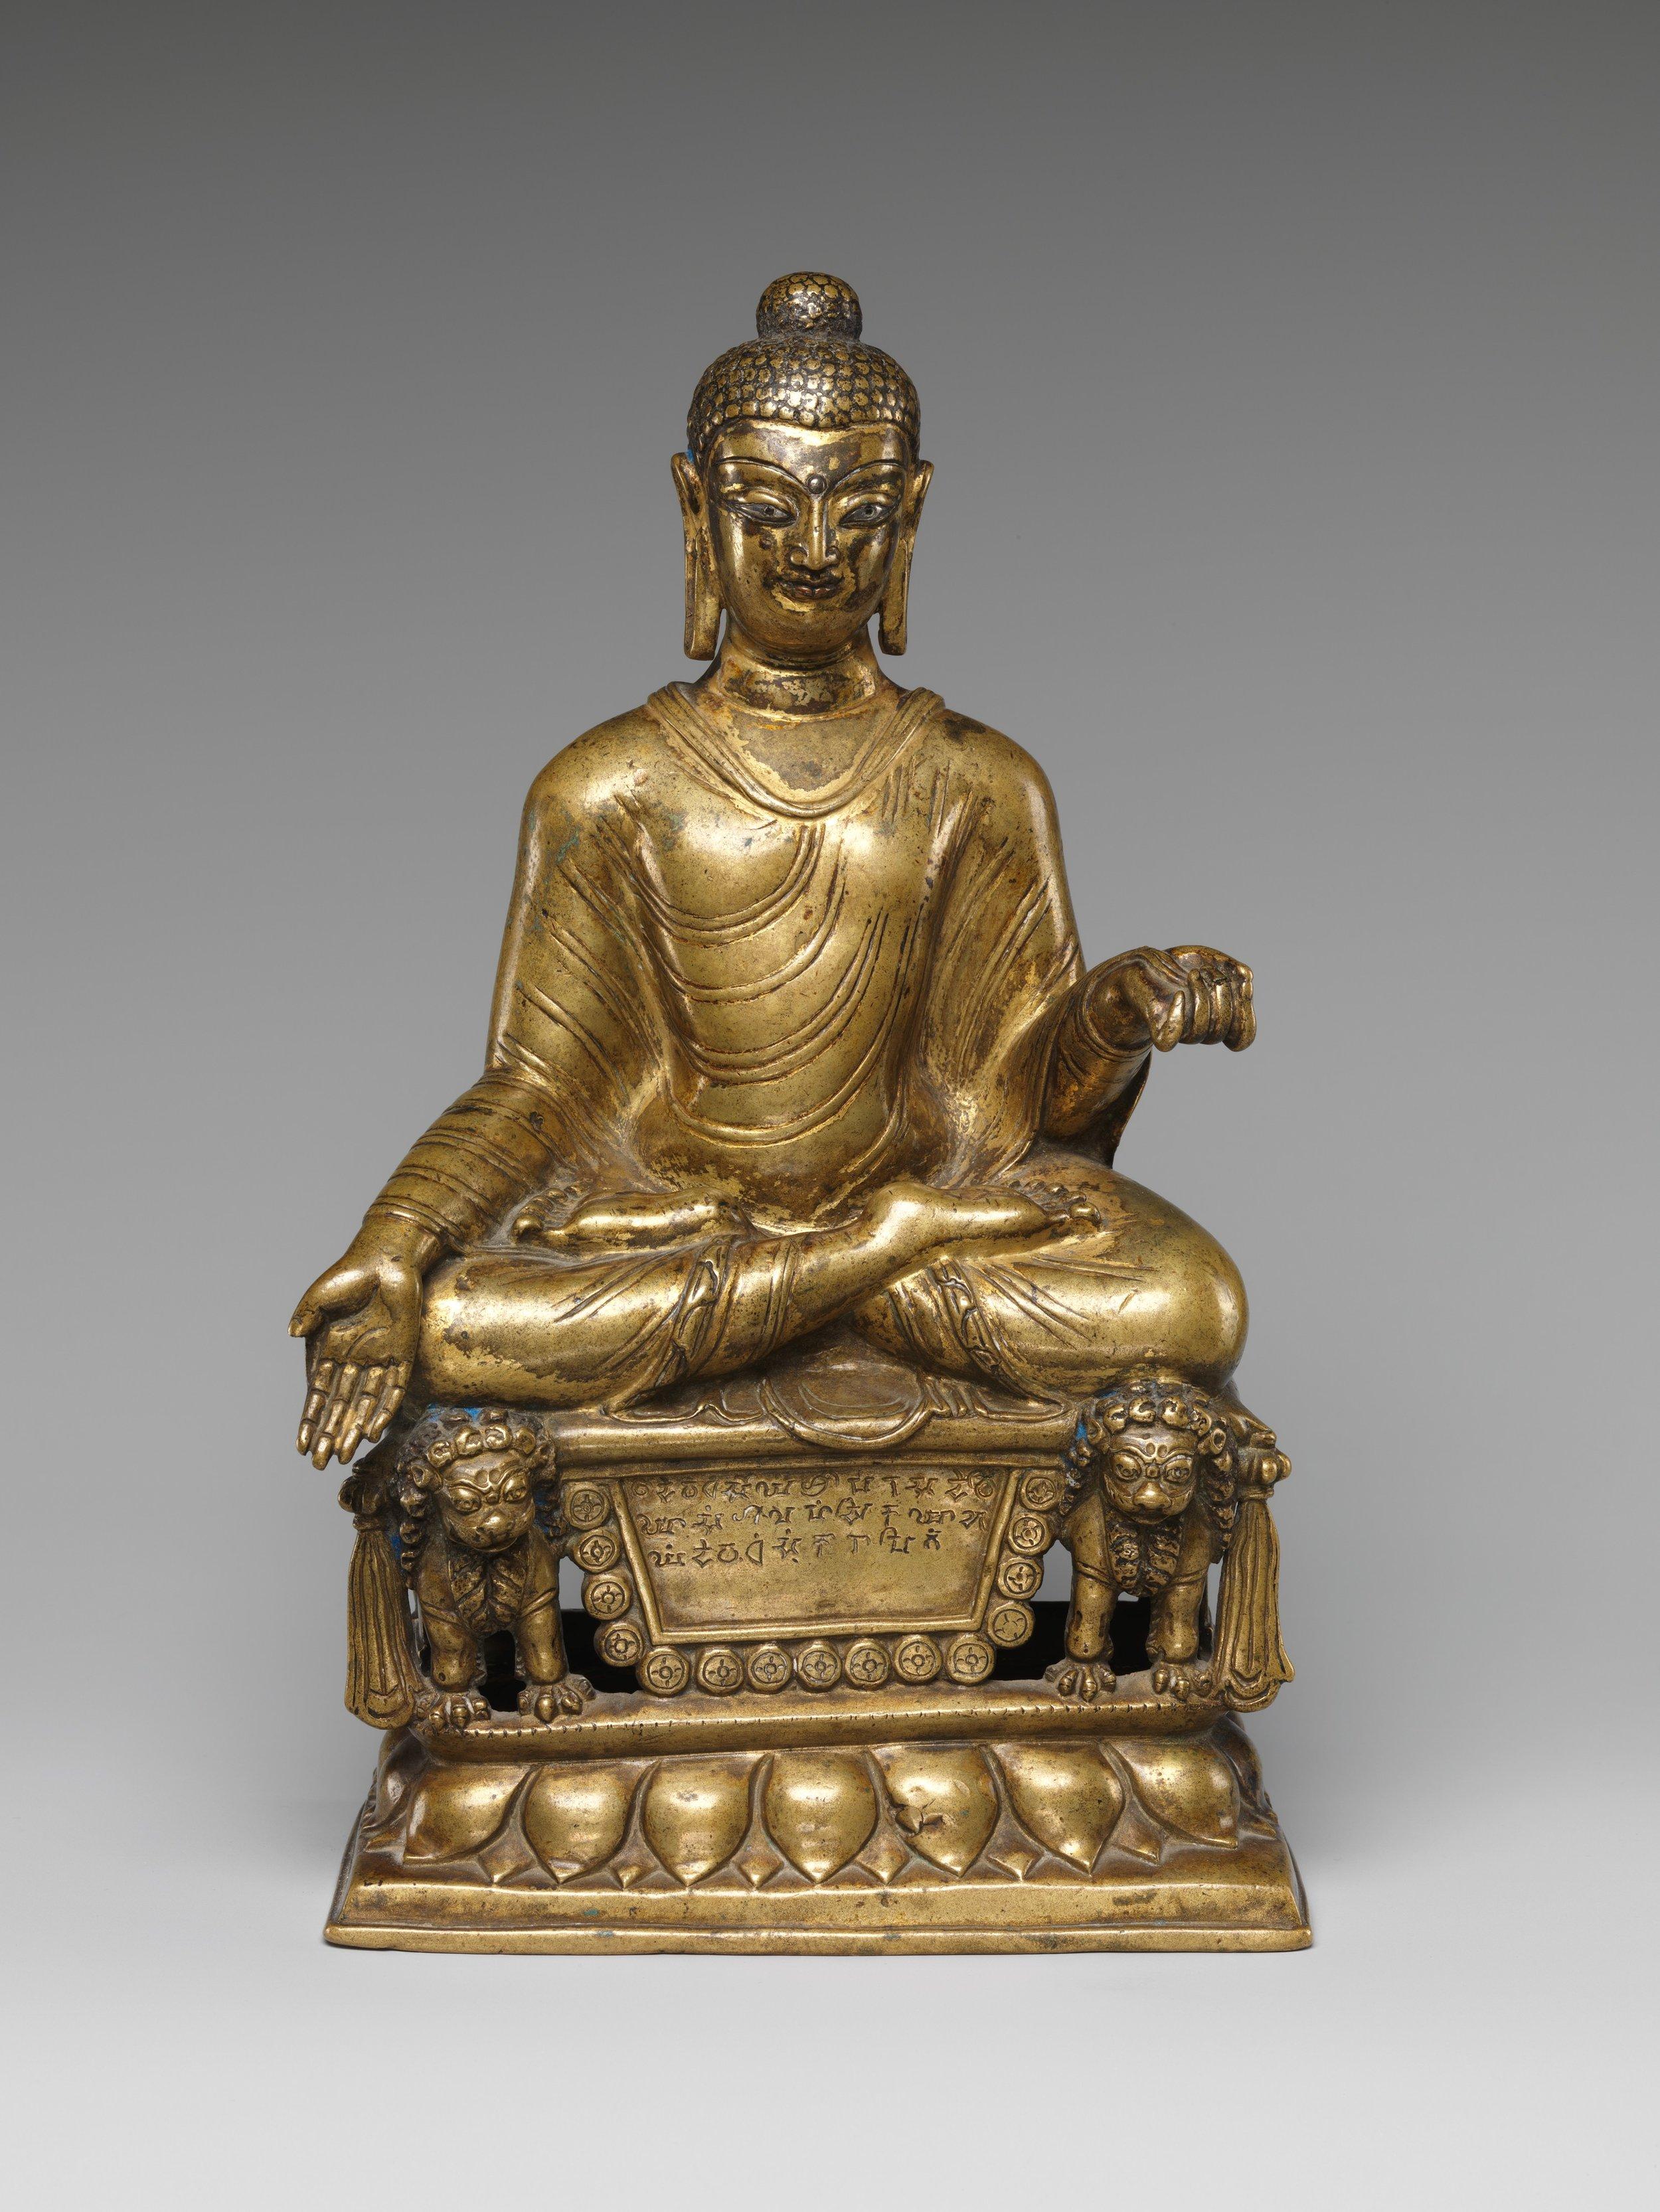 patola-shahi-buddha-granting-boons-gilgit